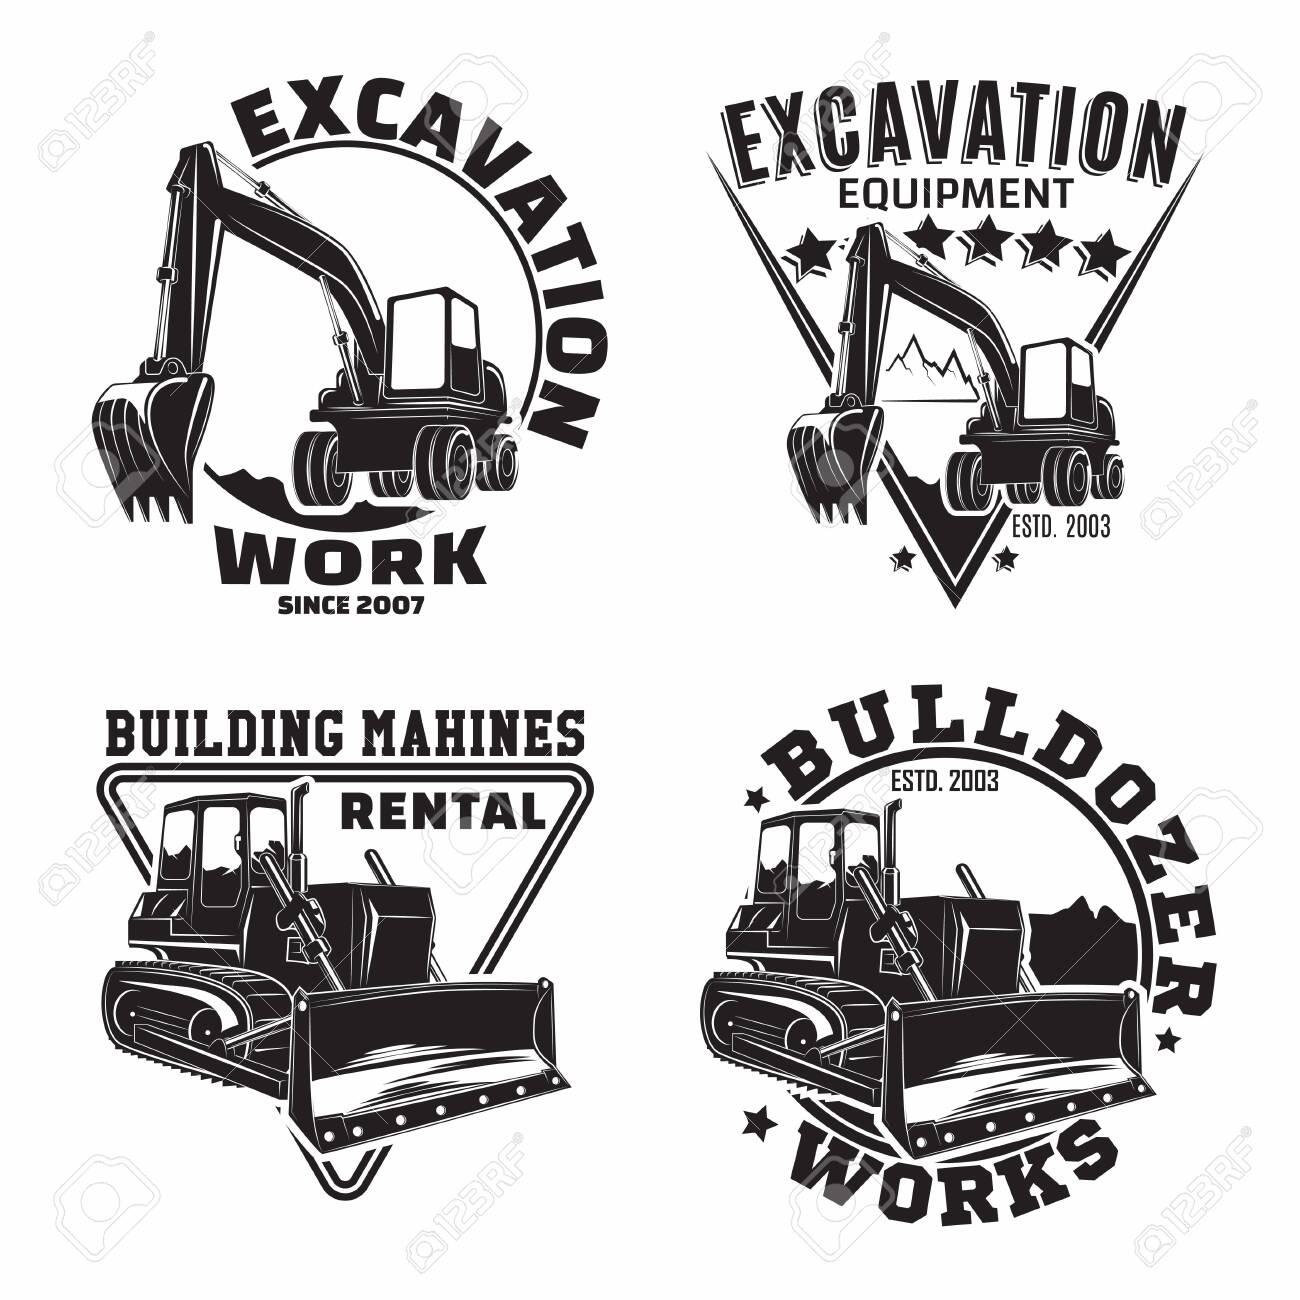 Set of Excavation work emblems design, emblems of bulldozer or building machine rental organization print stamps, constructing equipment, Heavy bulldozer machine typographyv emblems, Vector - 154820110